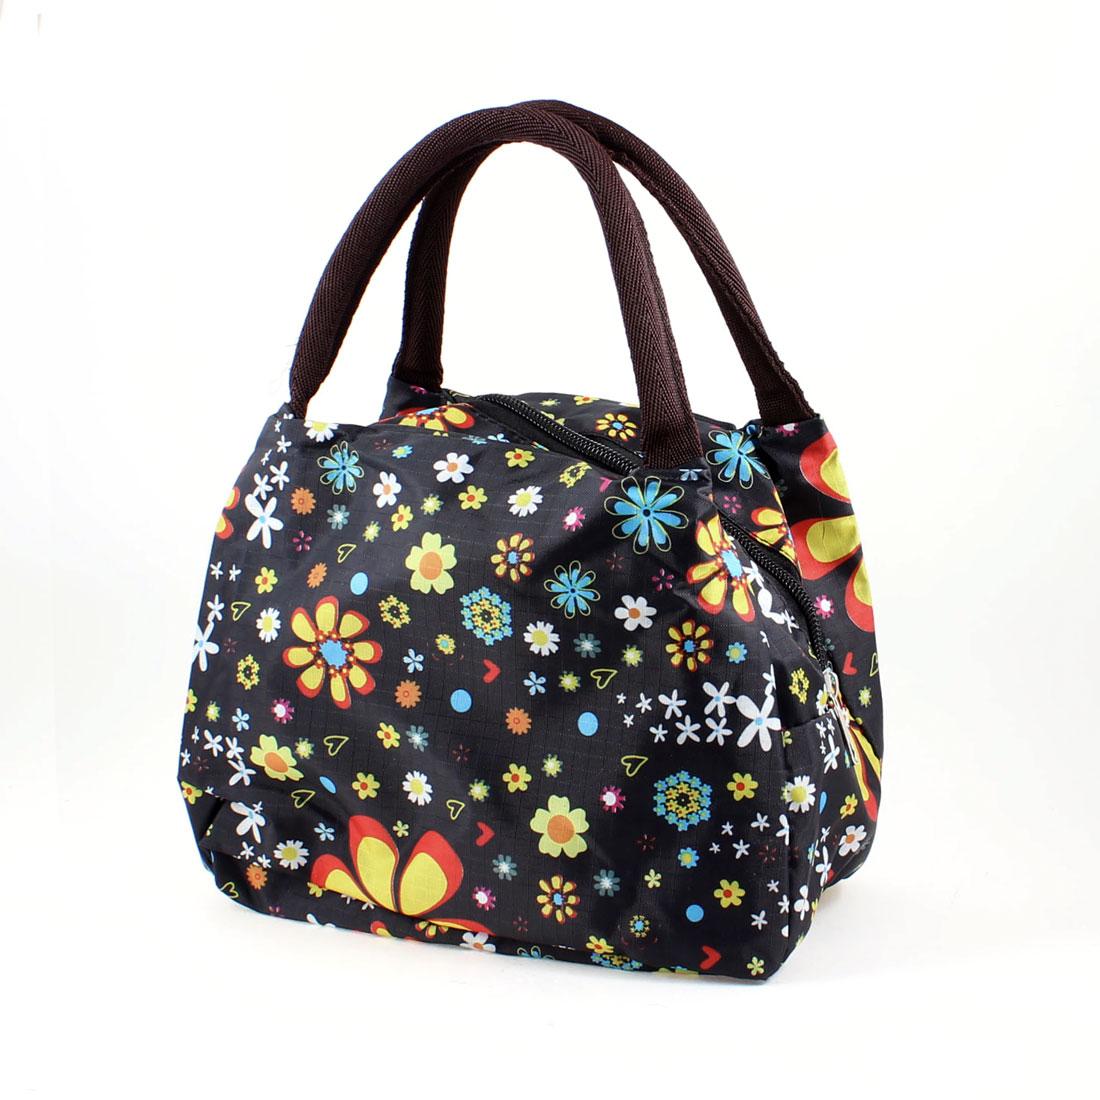 Colorful Floral Pattern Zip Shopping Handbag Bag Black for Ladies